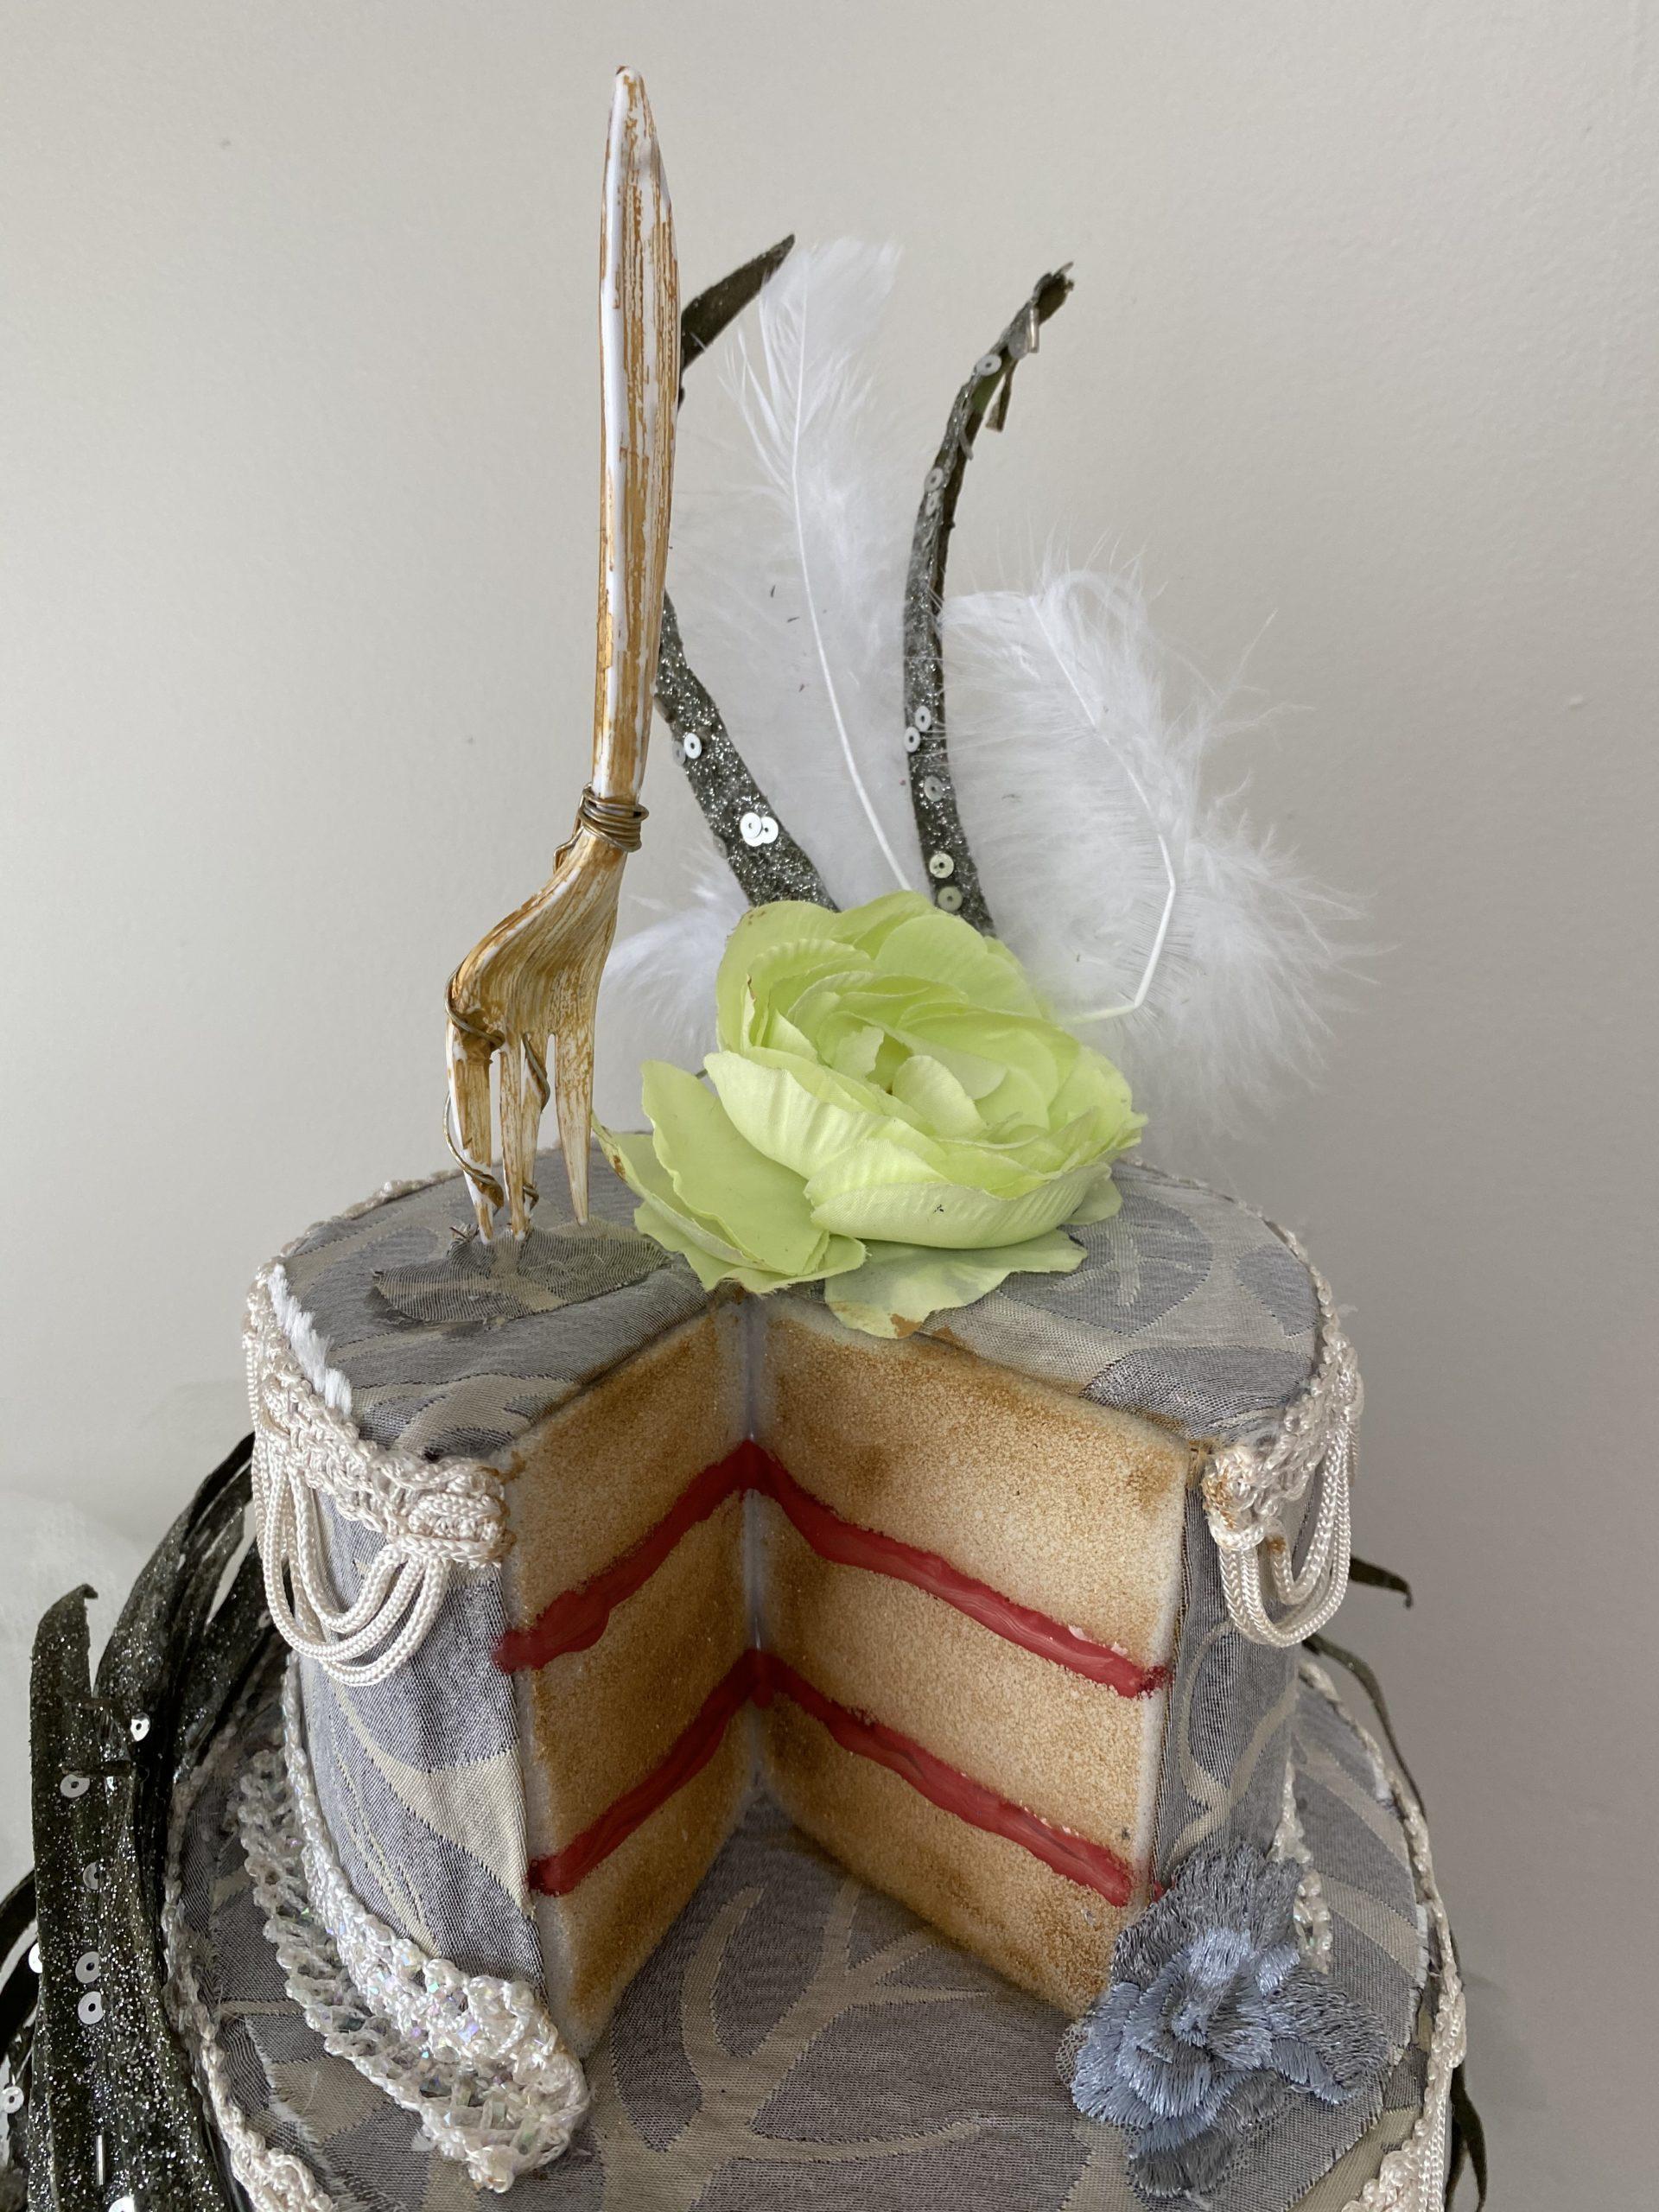 """Let them eat cake!"" – Tri-corner hat"